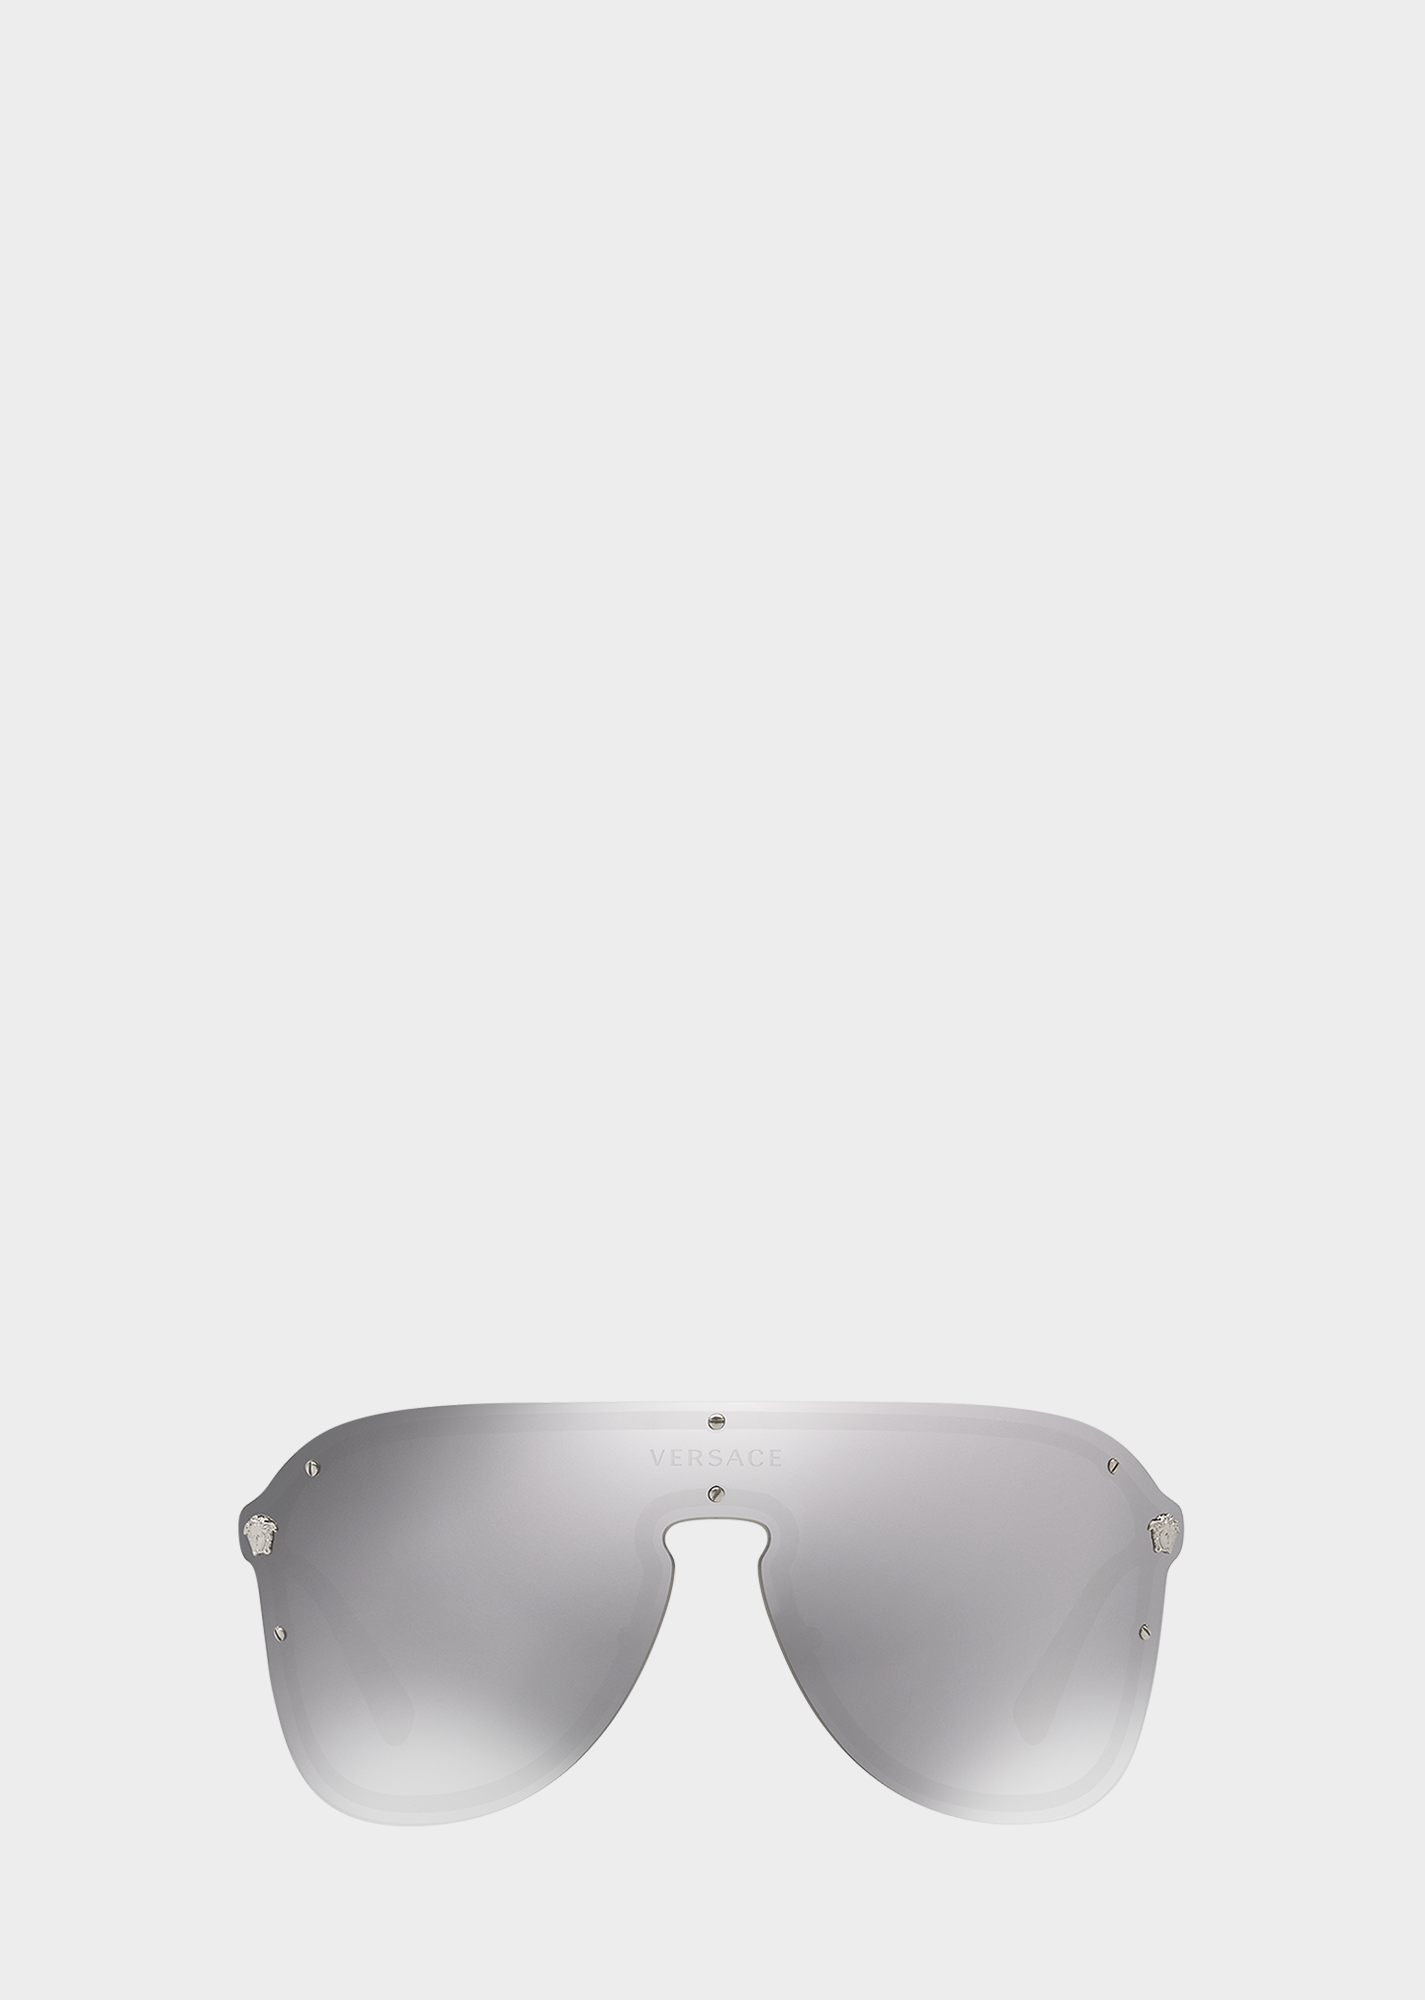 16cdfe76e732 Silver  Frenergy Visor Sunglasses - ONUL Eyewear